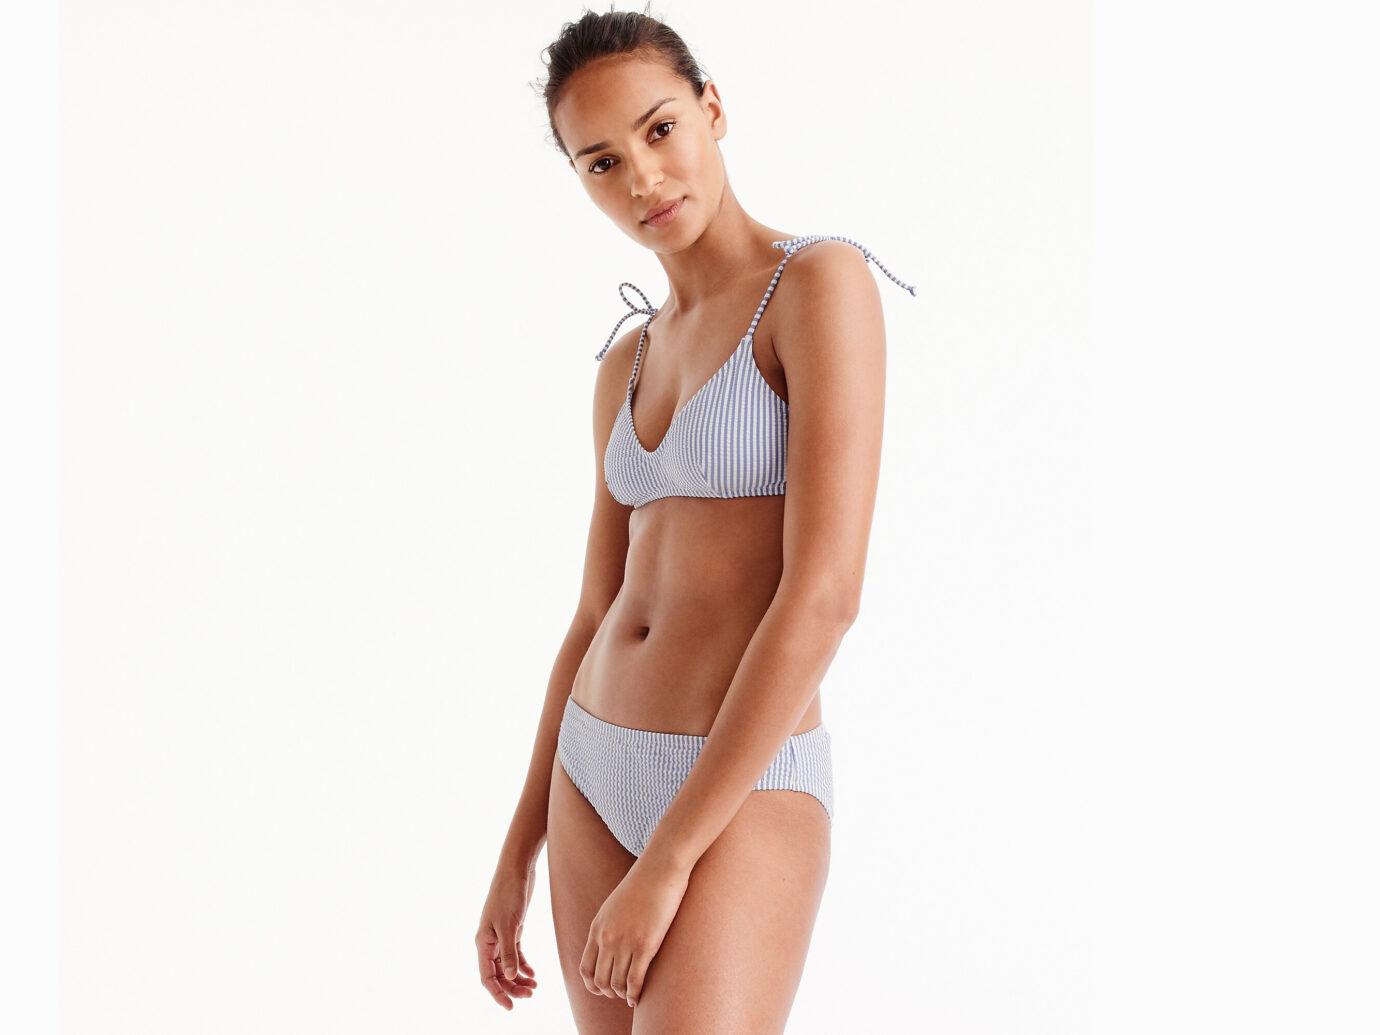 J.Crew Seersucker Bikini